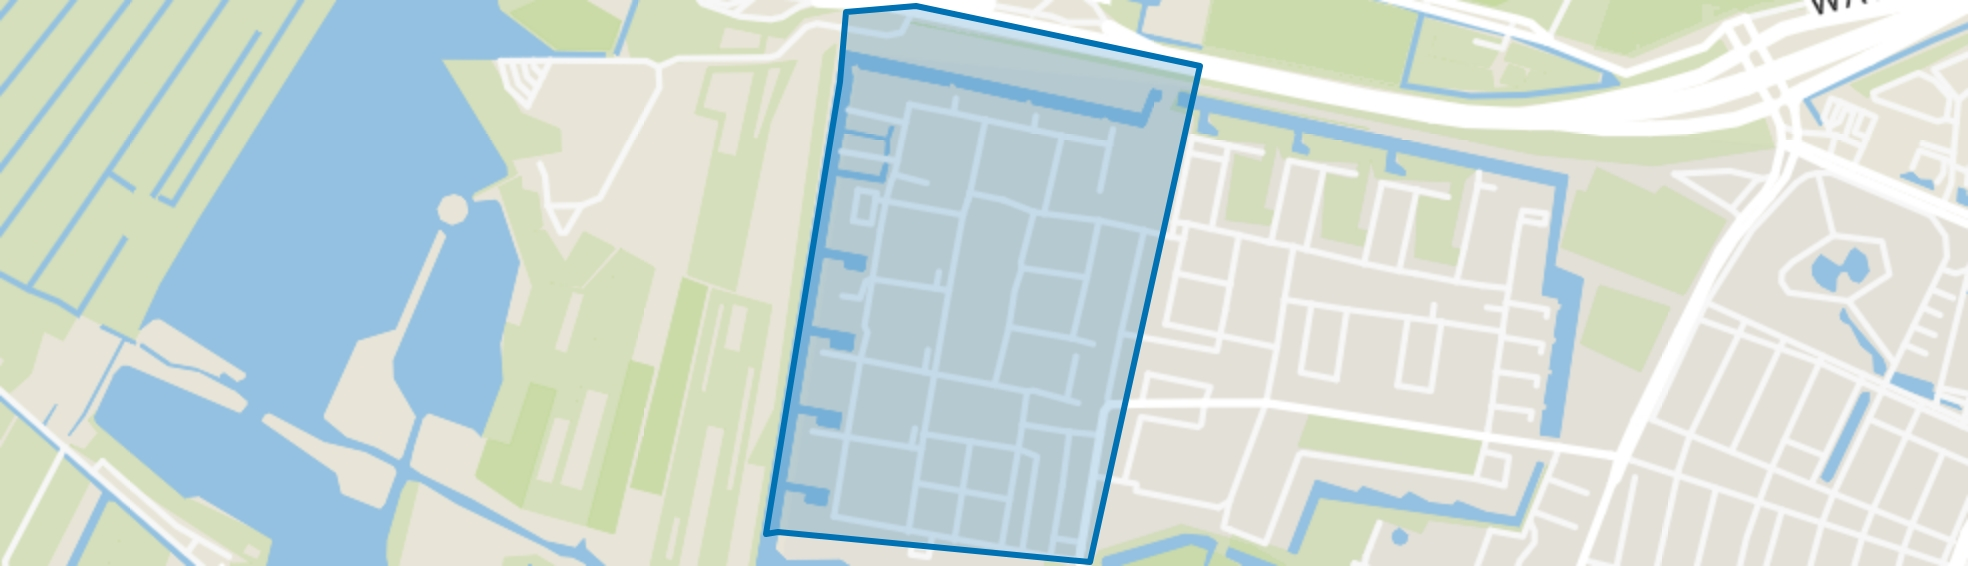 Lage Weide, Vlaardingen map